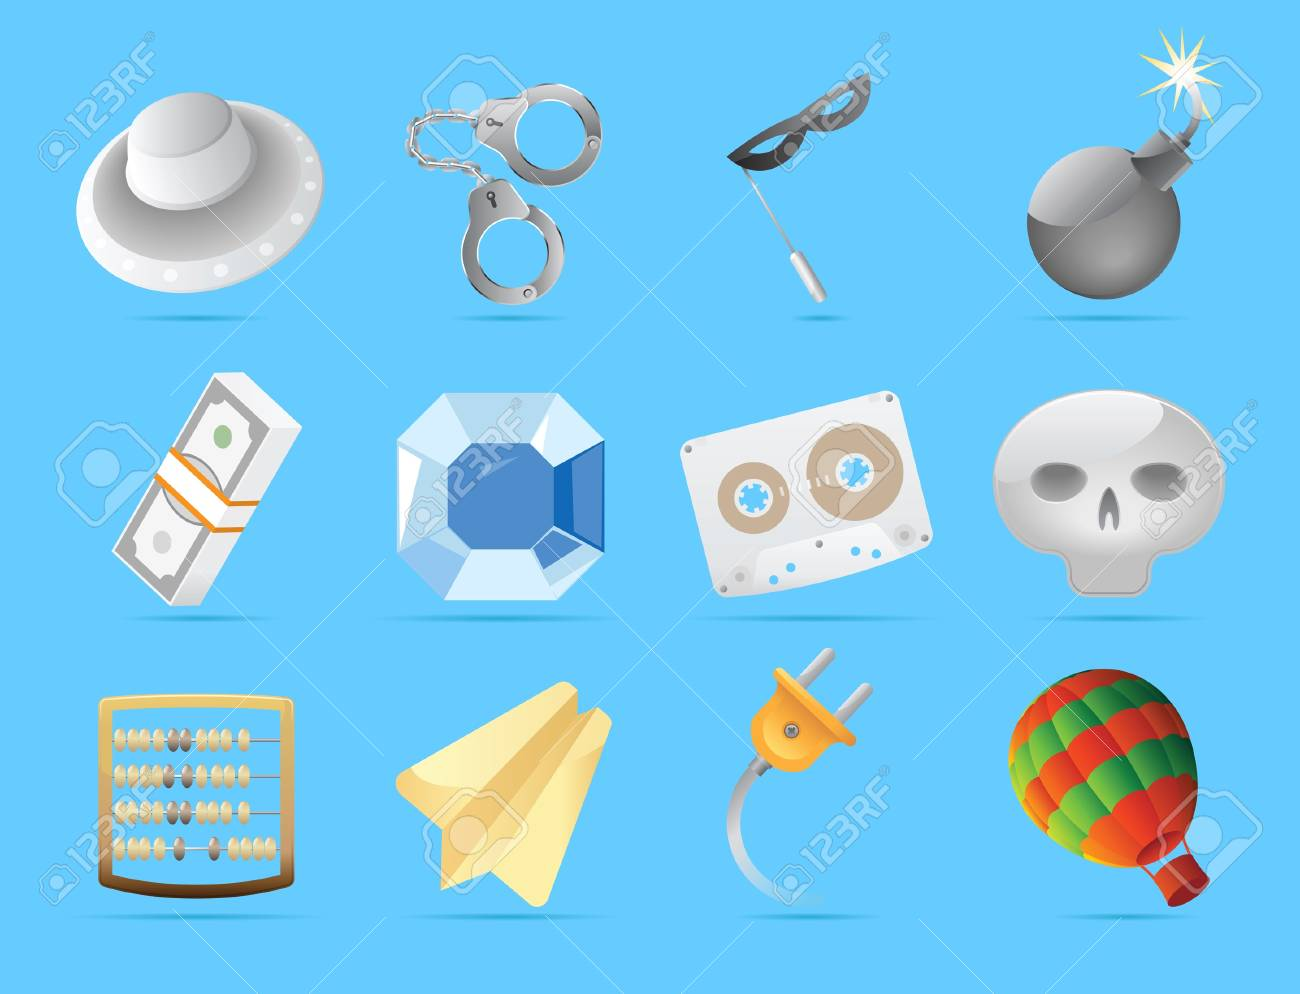 Miscellaneous icons. Stock Vector - 13094363